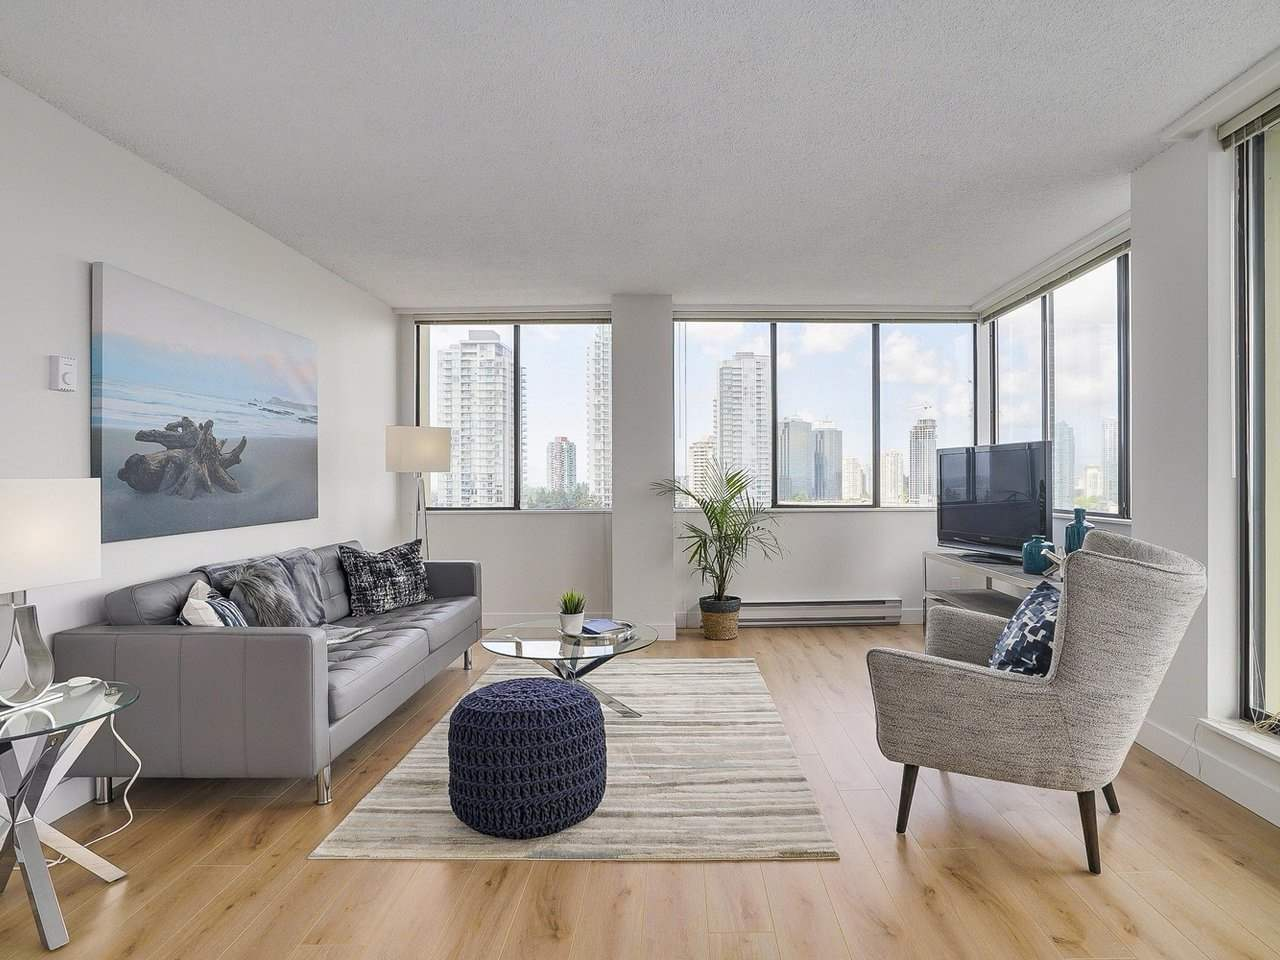 Condo Apartment at 1806 6540 BURLINGTON AVENUE, Unit 1806, Burnaby South, British Columbia. Image 2